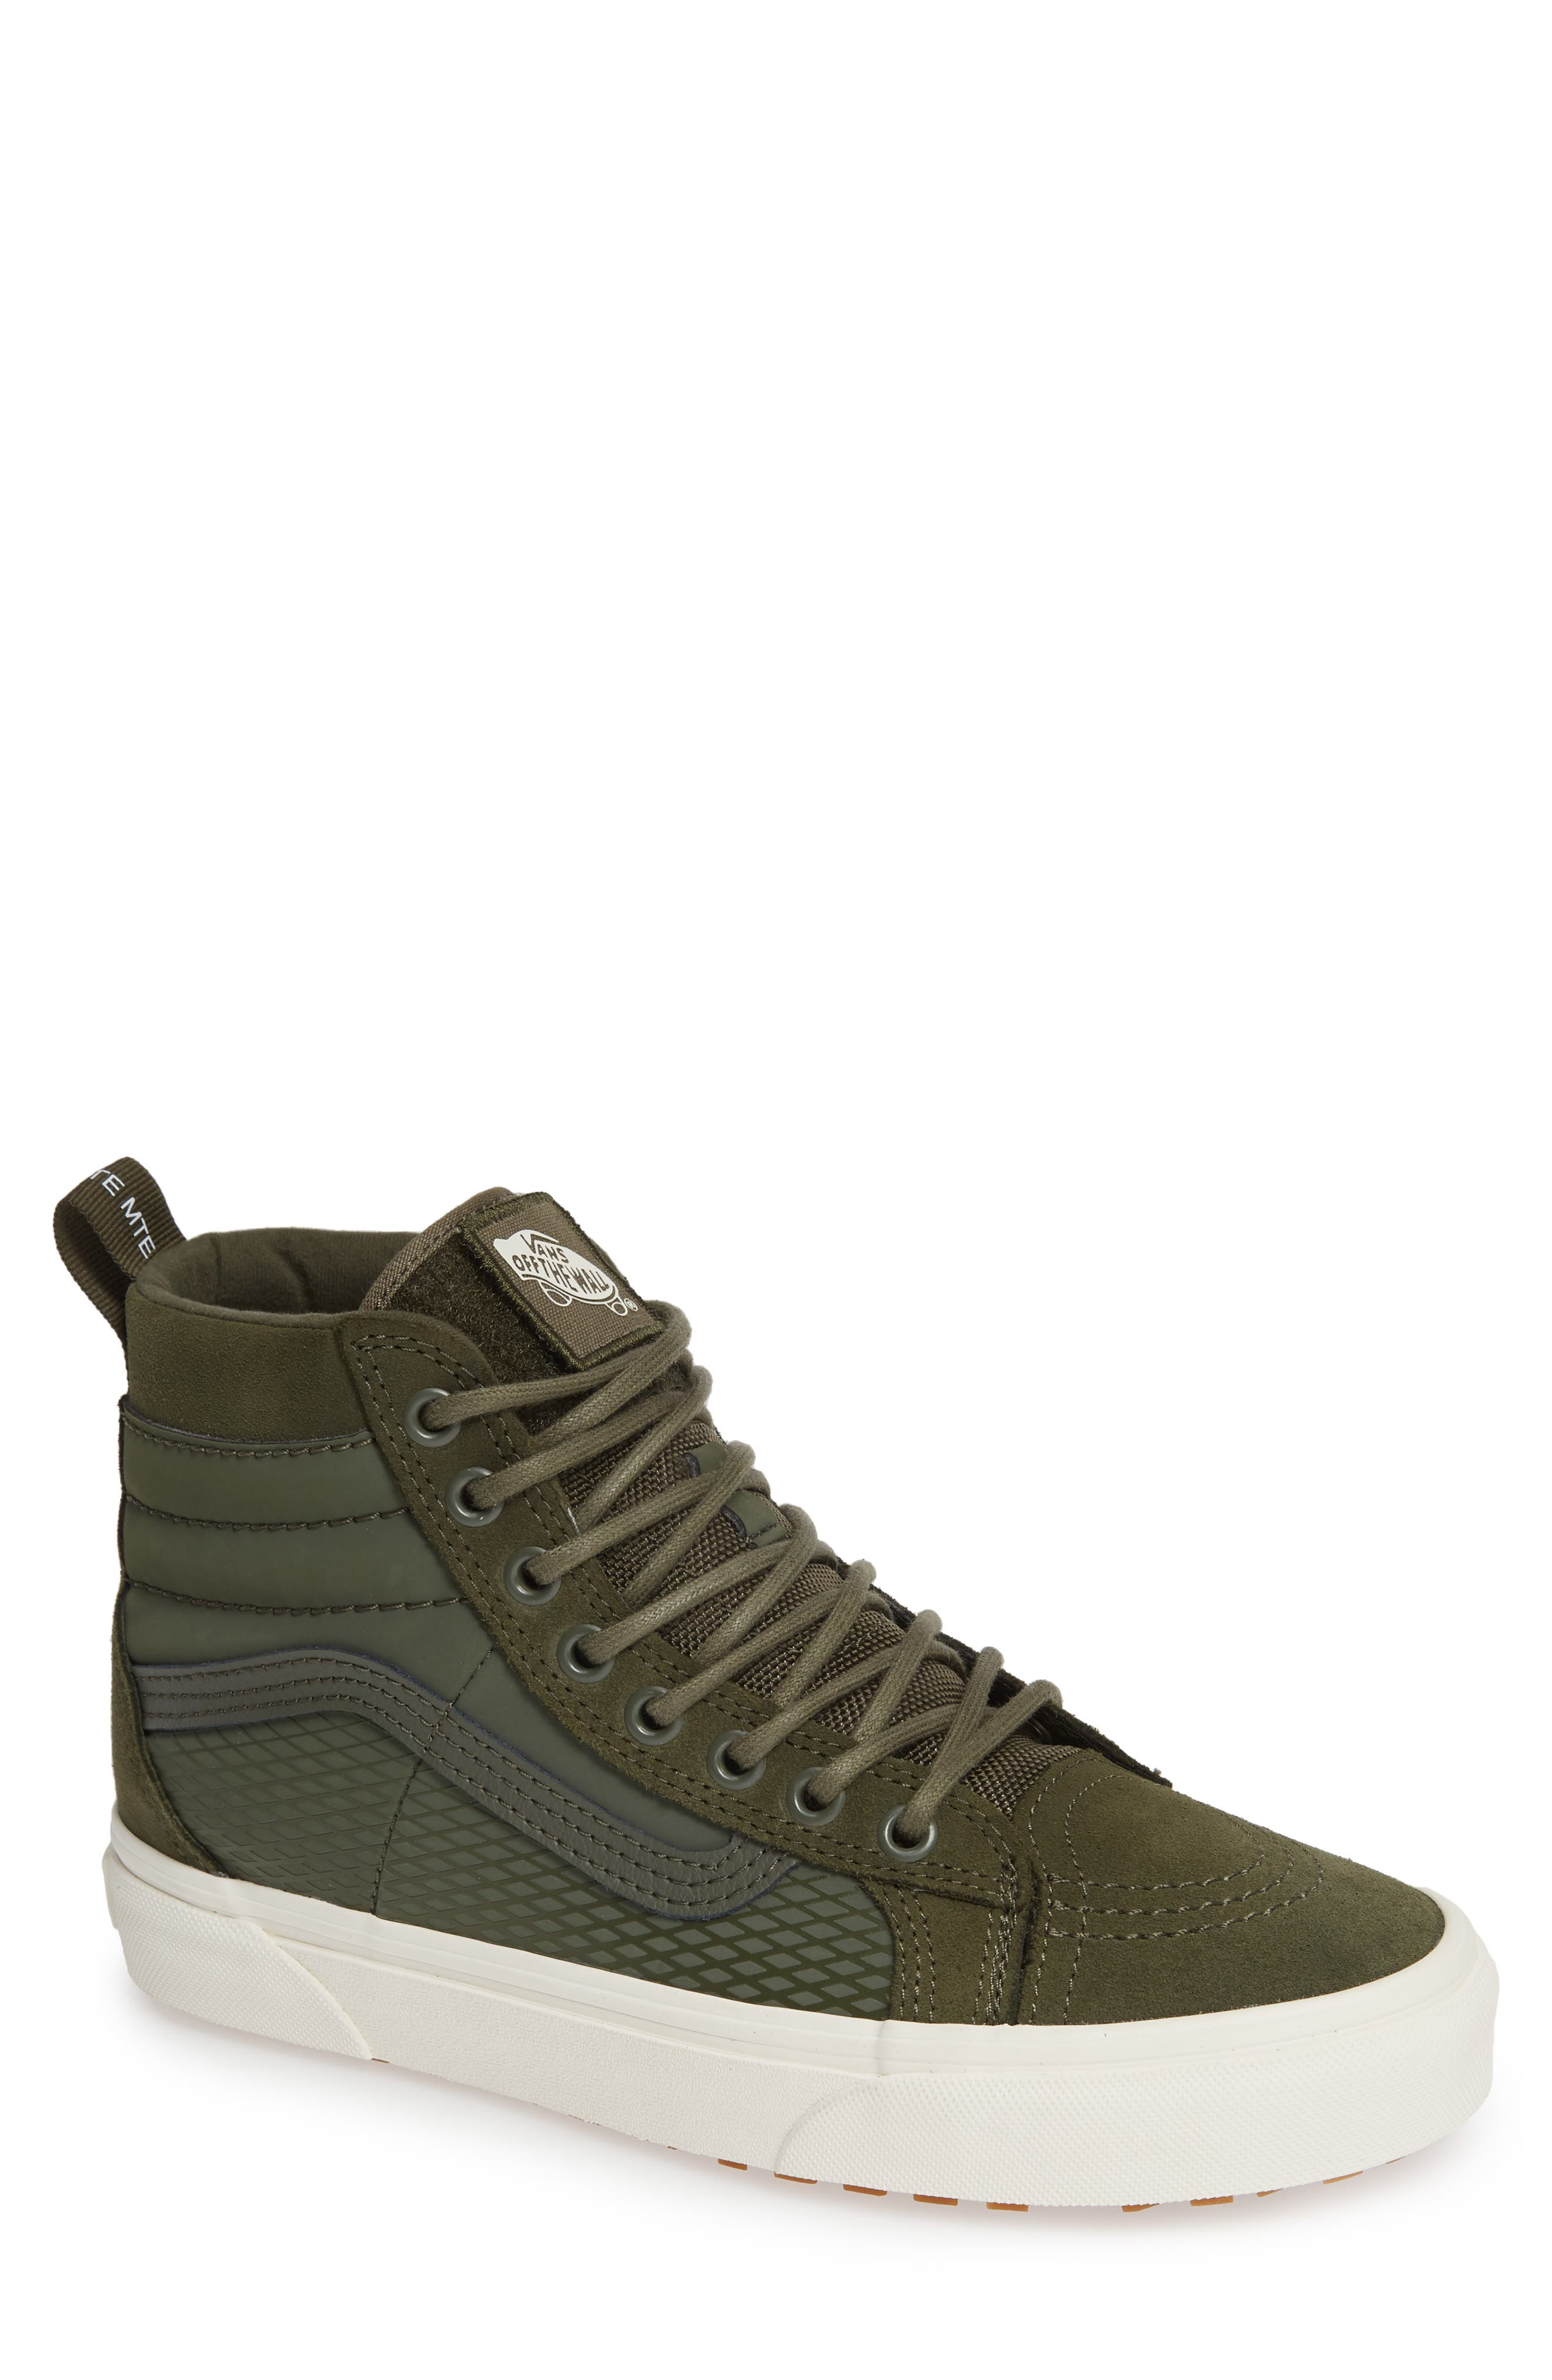 Sk8-Hi 46 MTE DX Sneaker,                             Main thumbnail 1, color,                             GRAPE LEAF